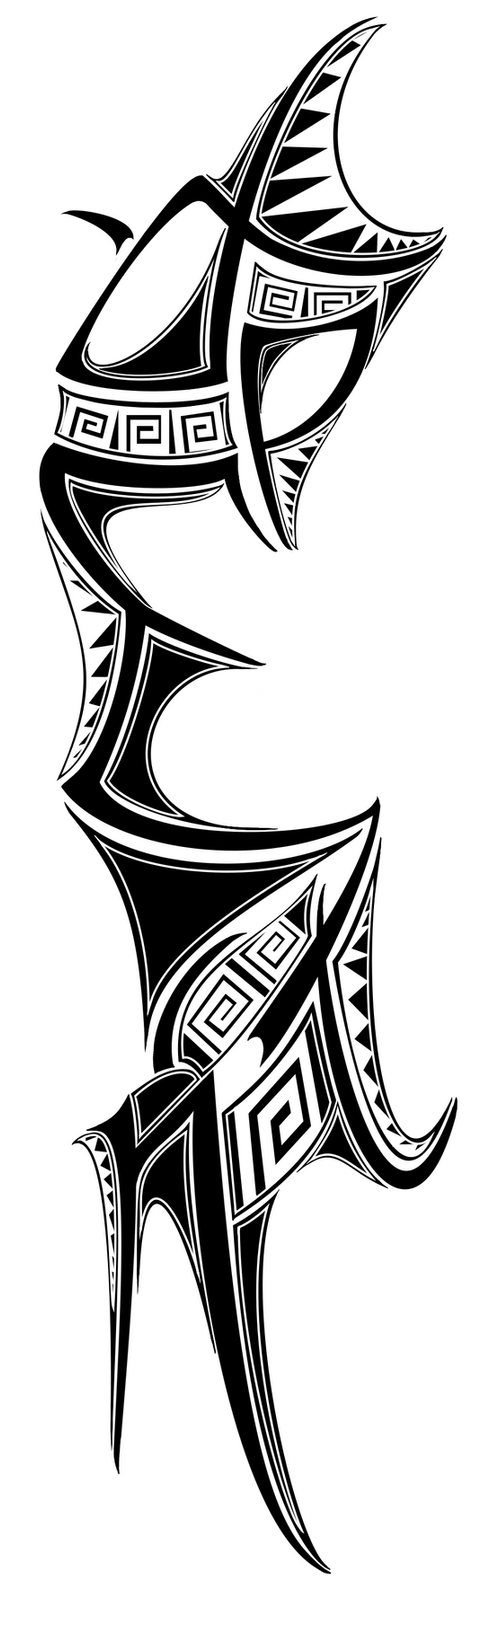 arete tattoo design 2 by eternalnight11 on deviantart. Black Bedroom Furniture Sets. Home Design Ideas